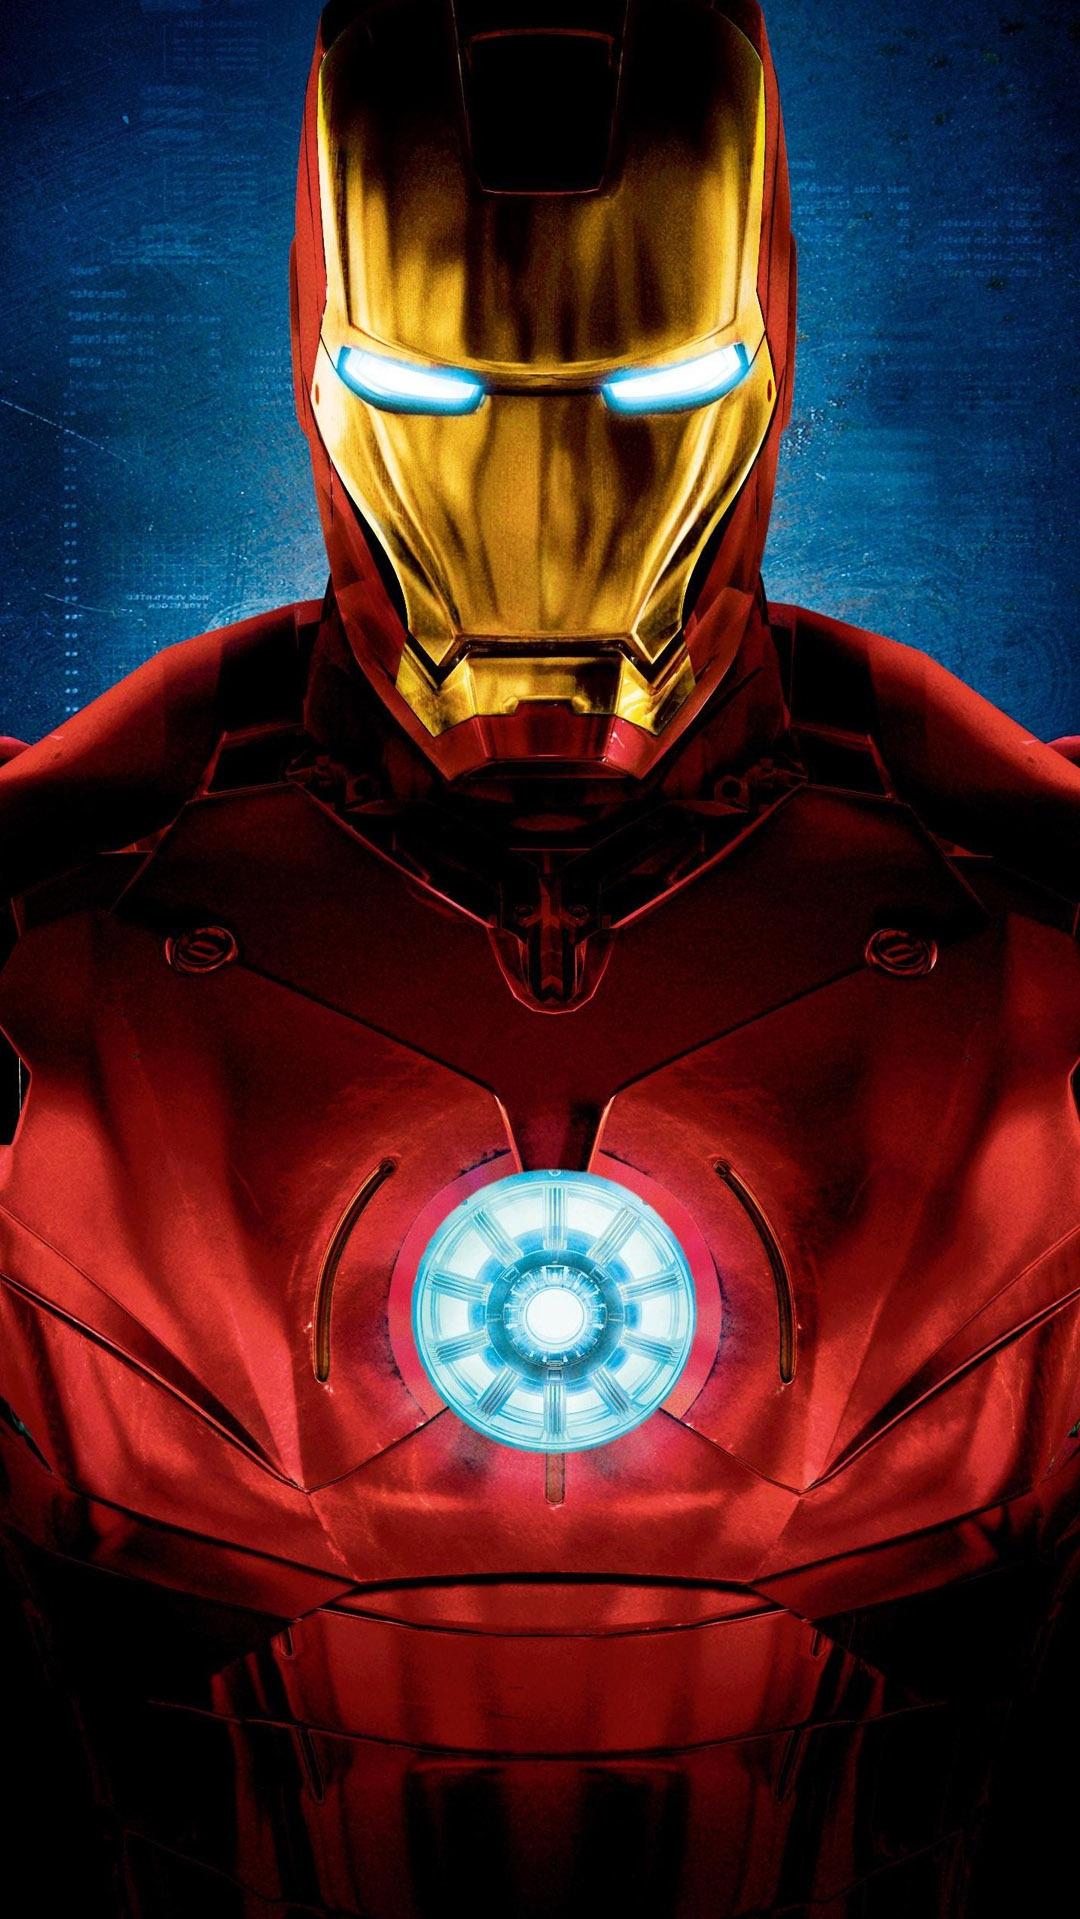 iron man3 Armour Red iPhone Wallpaper iphoneswallpapers com